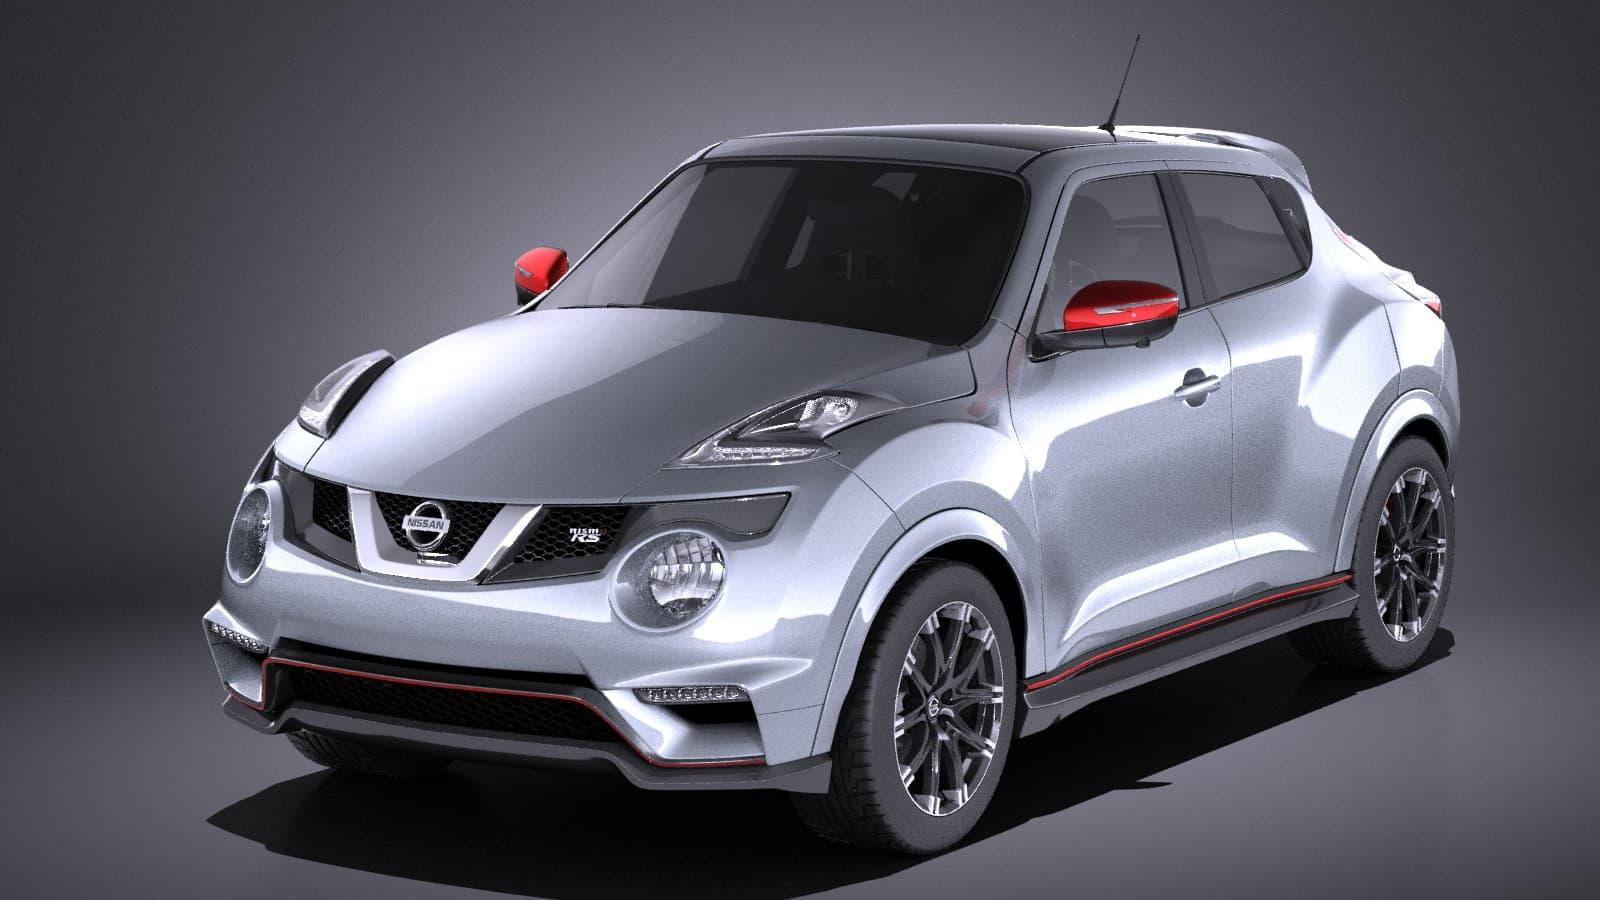 Nissan Juke Nismo Rs >> Nissan Juke Nismo Rs 2017 Vray 3d Model